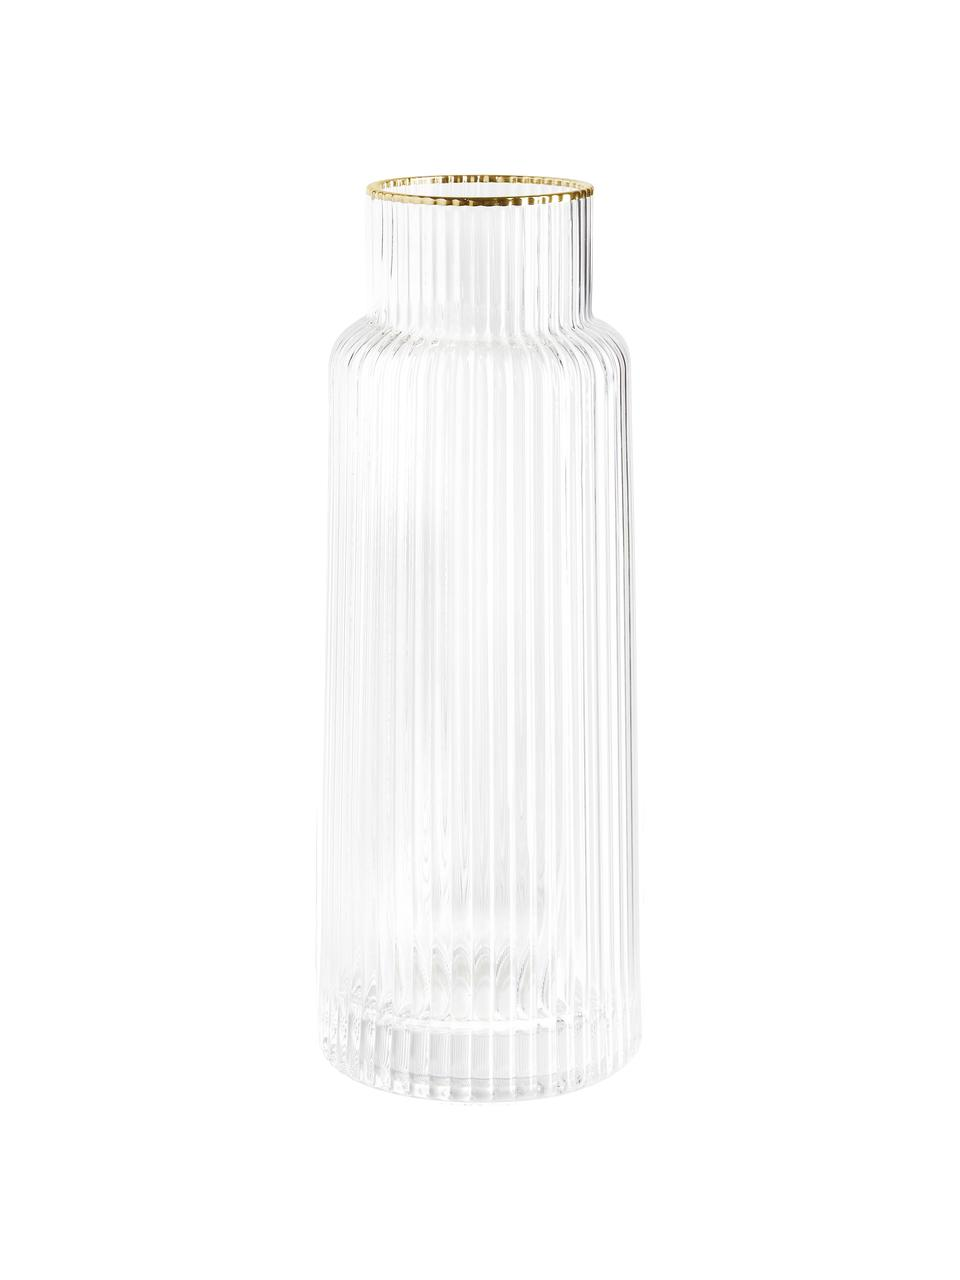 Carafe à eau artisanale à rebord doré Minna, Transparent, or